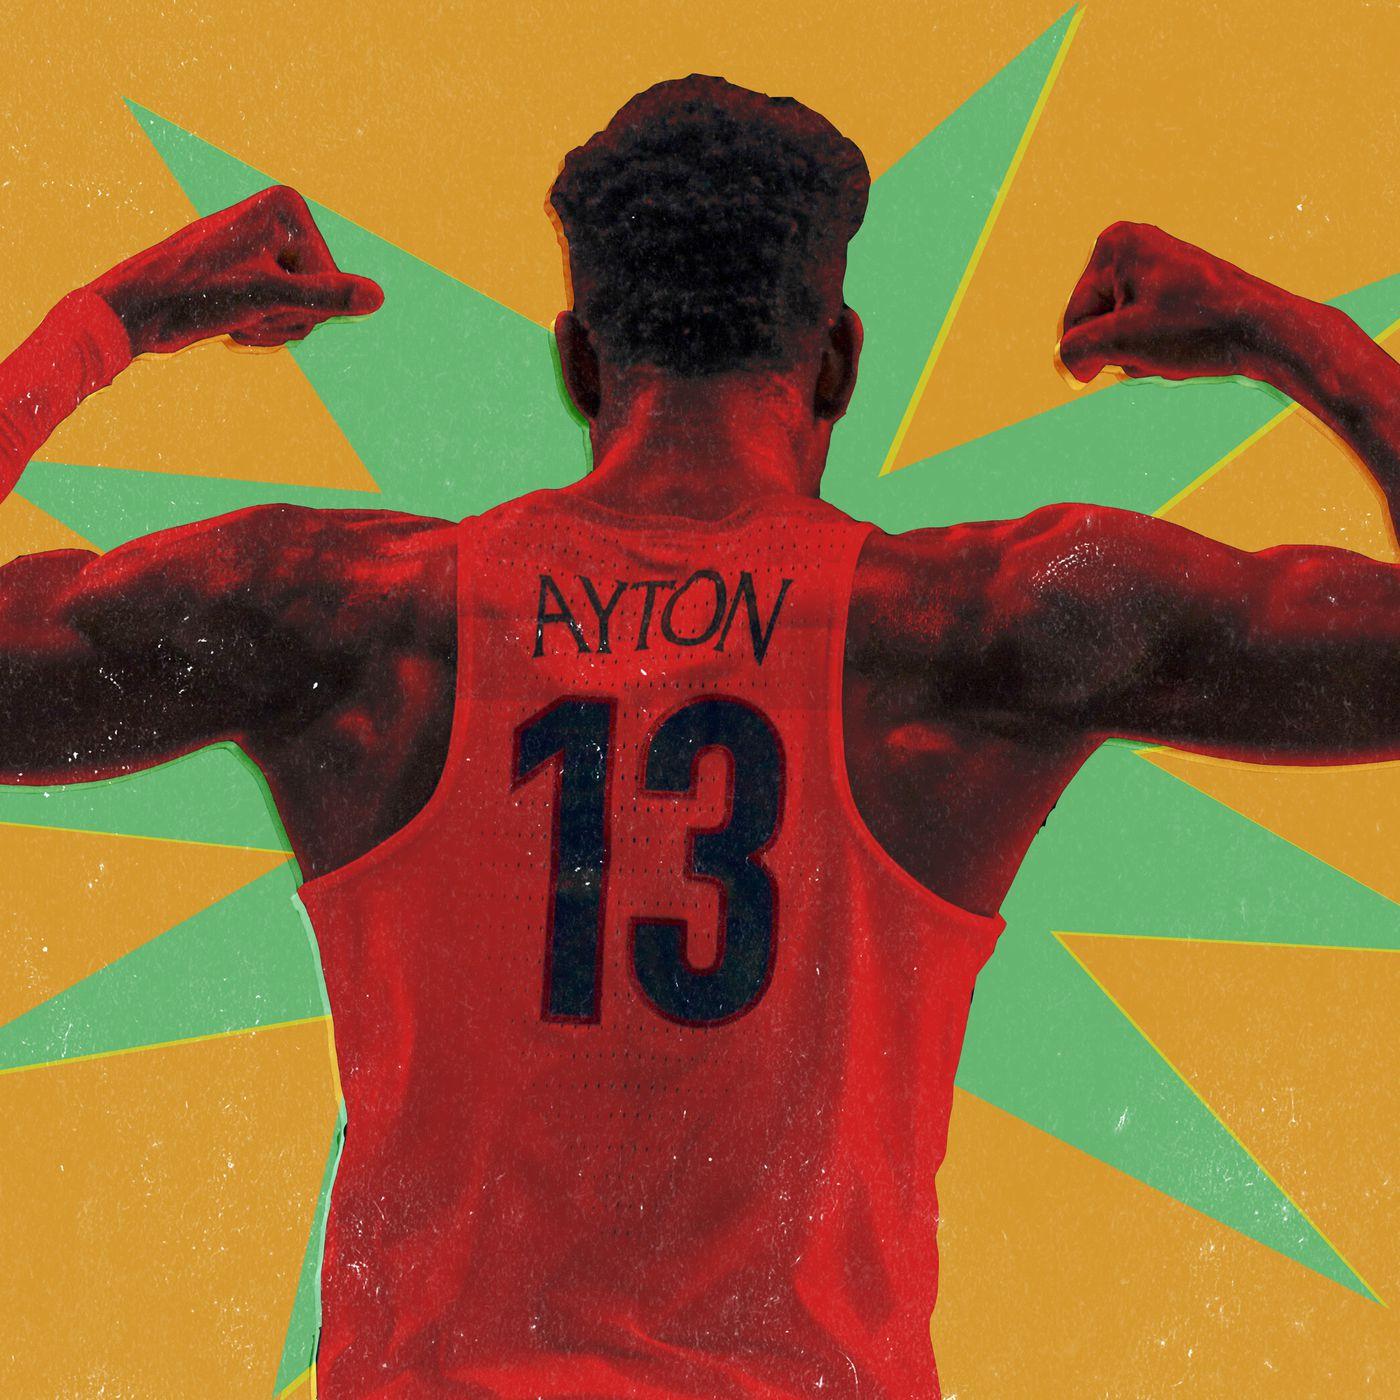 36782bcf19d 2018 NBA Mock Draft - Fake Teams